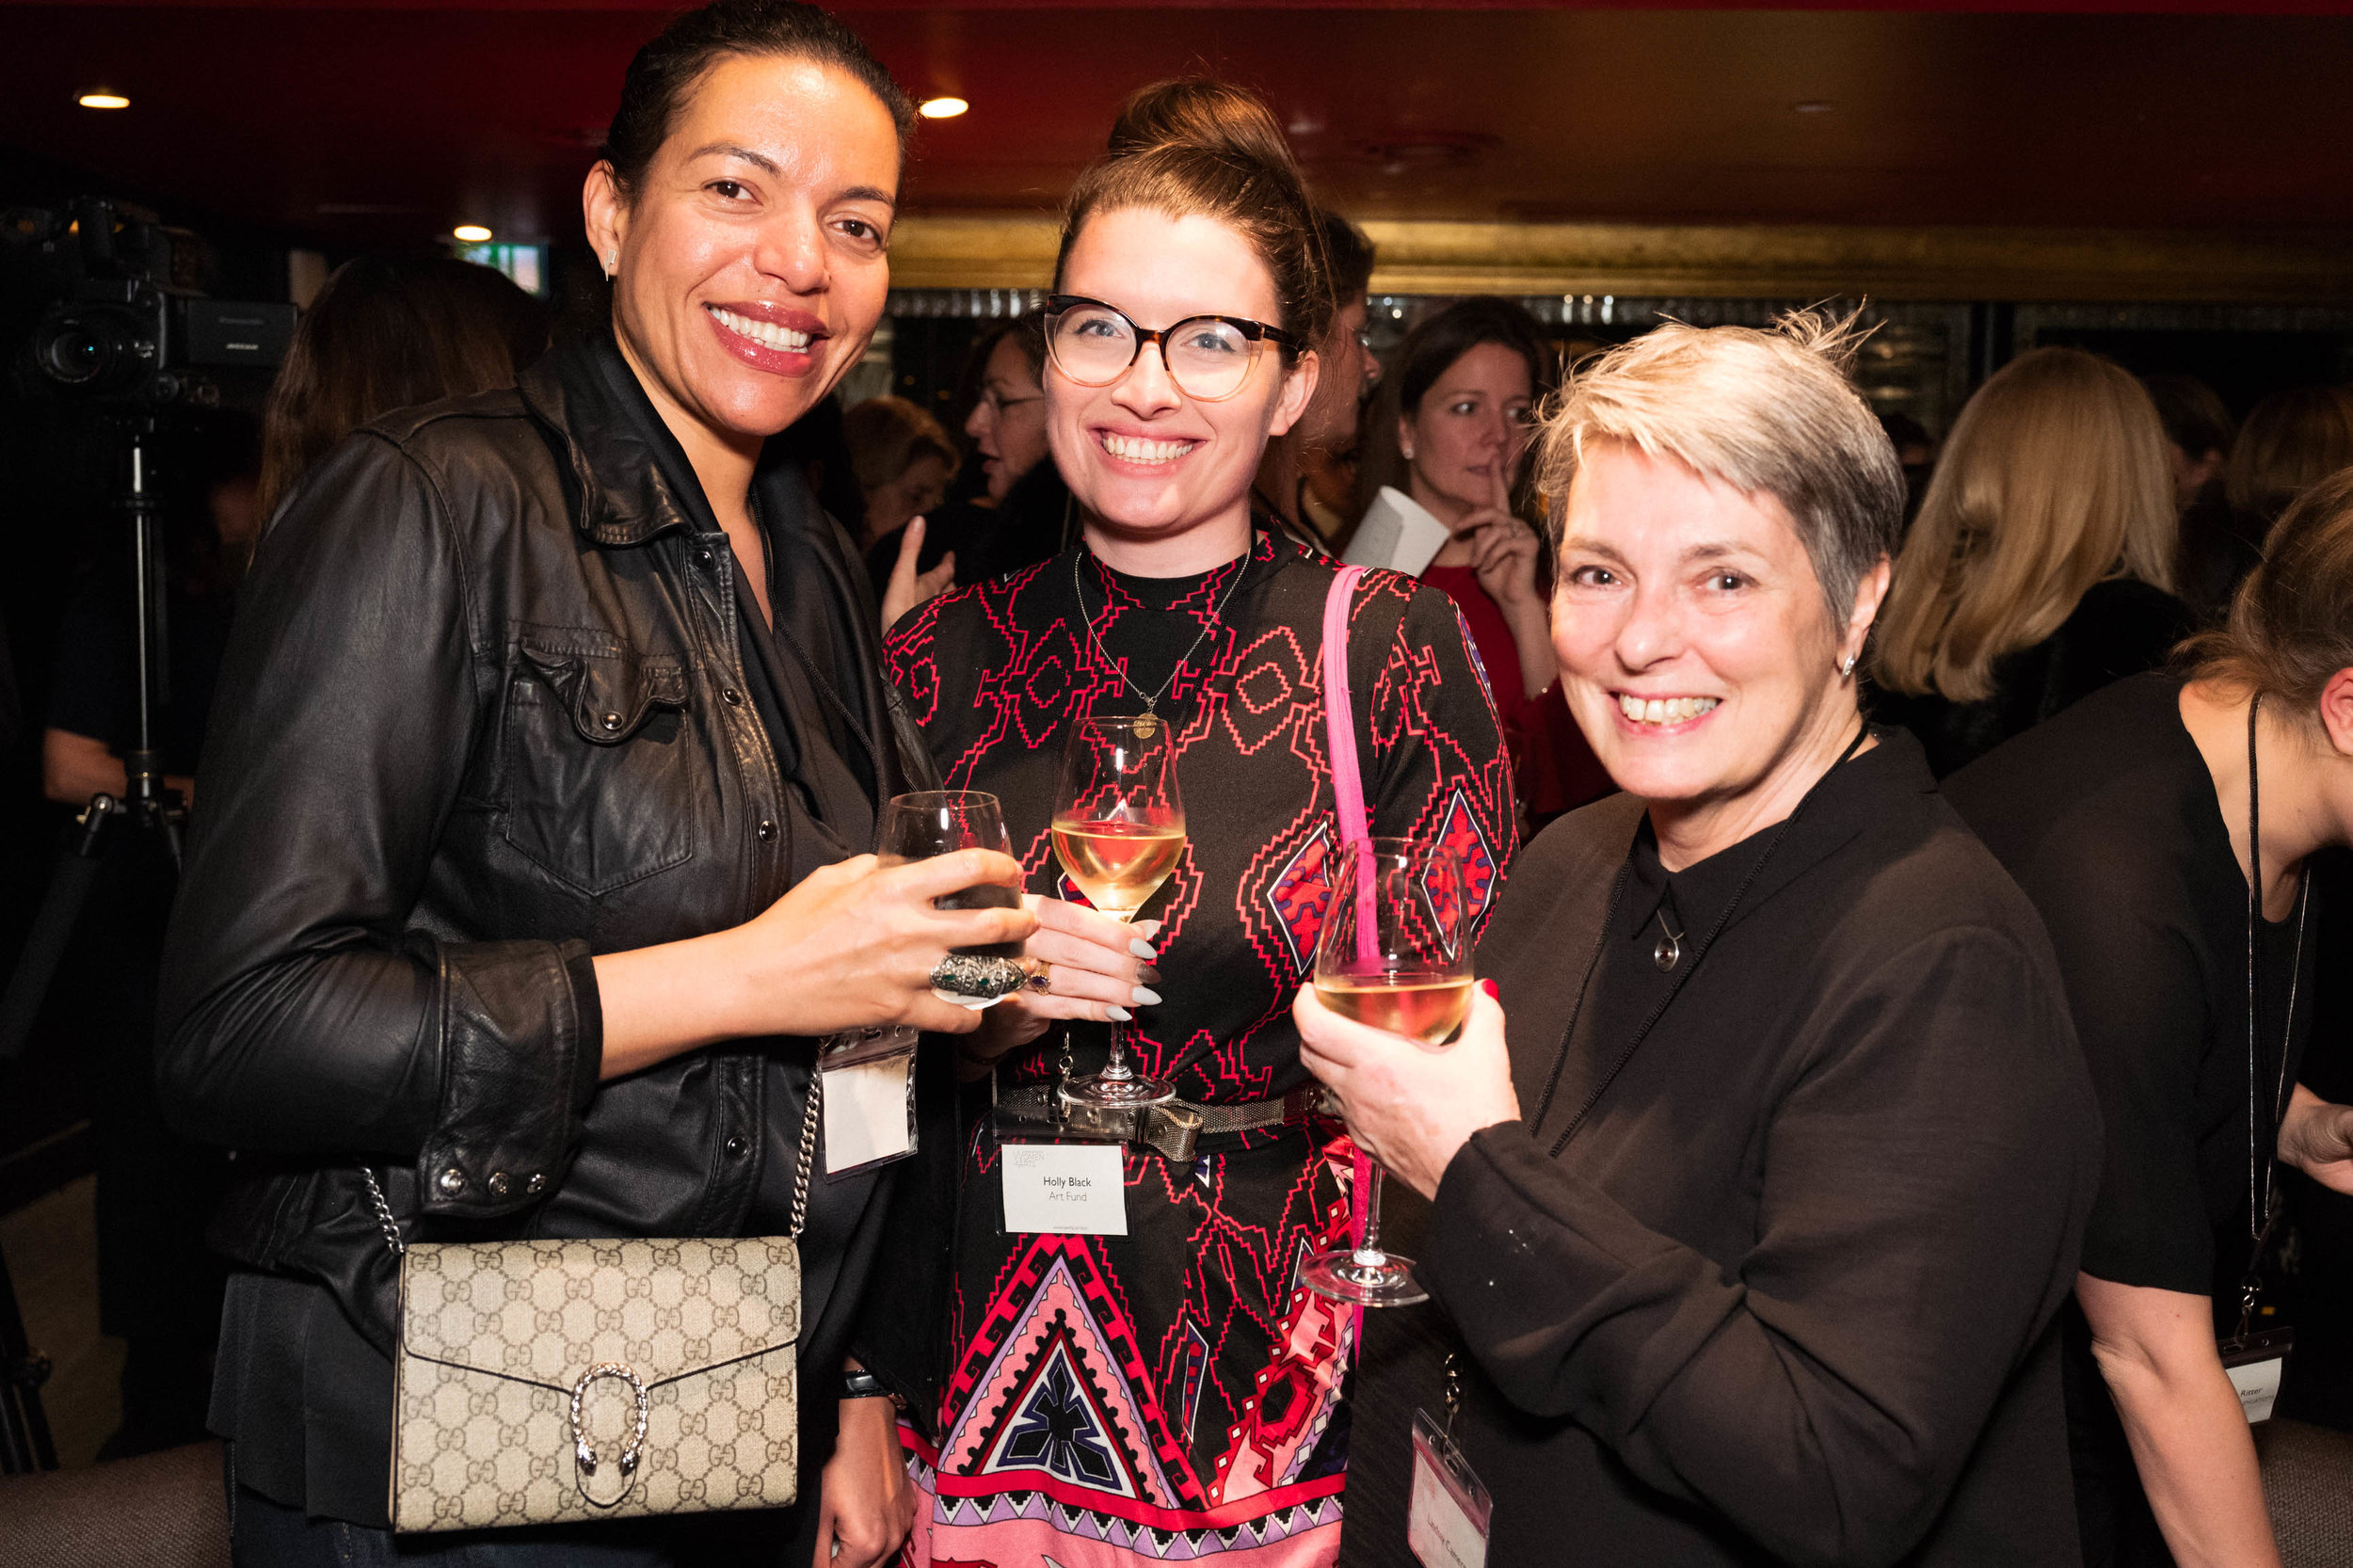 Melanie Grant, Holly Black and Lindsay Cameron